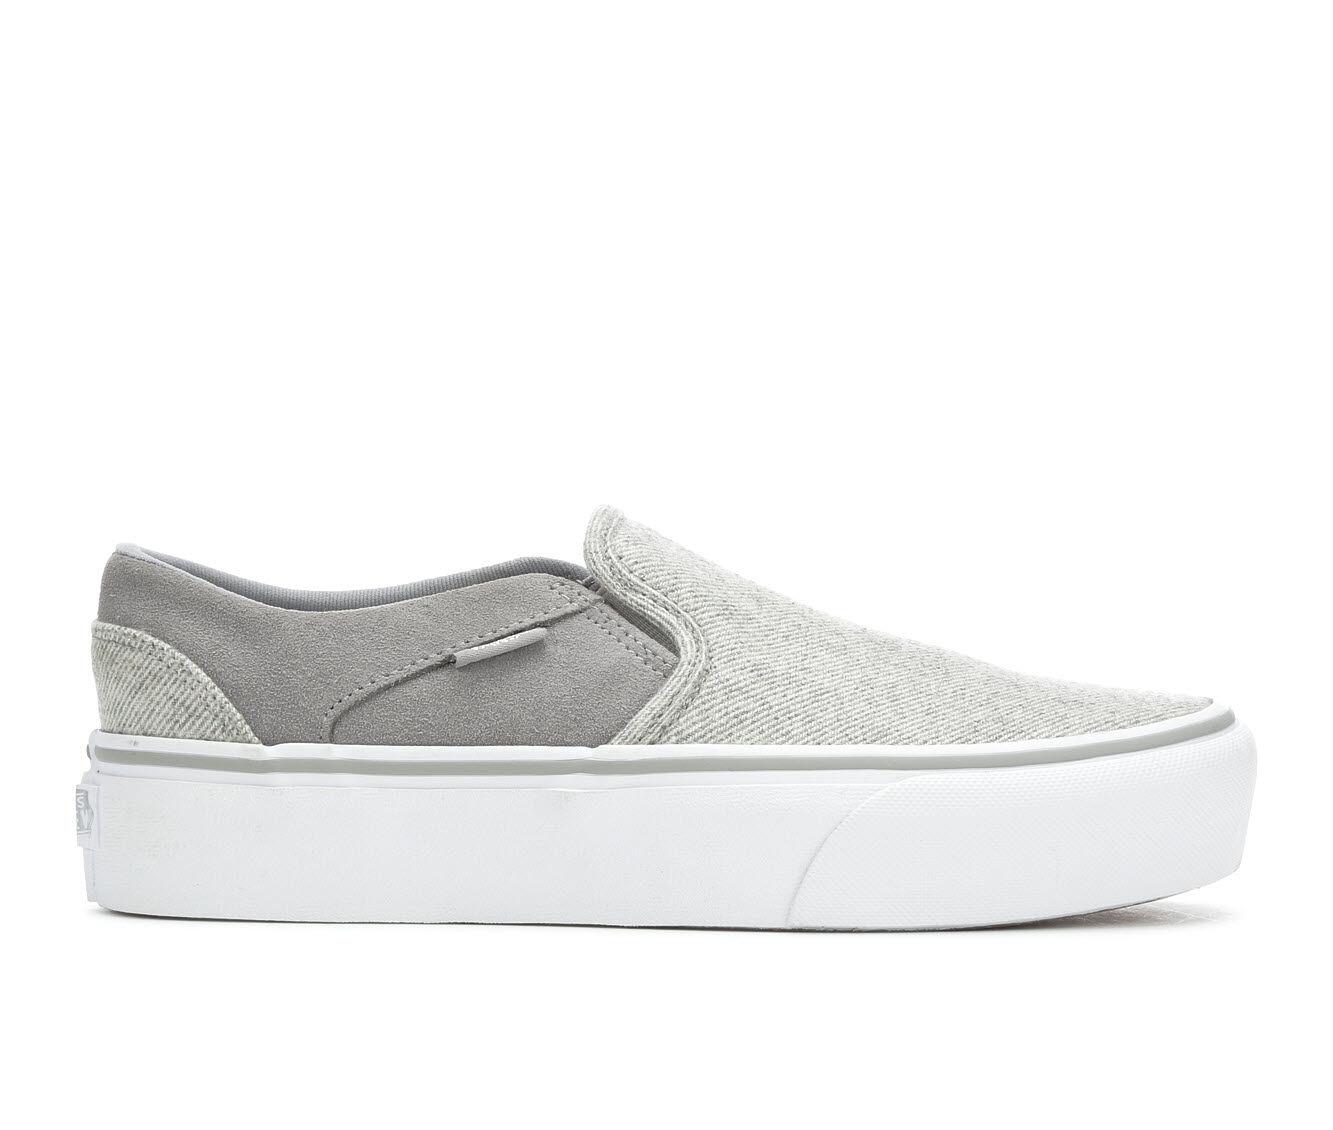 Sales Quality Assurance Women's Vans Asher Platform Skate Shoes Drizzle/White